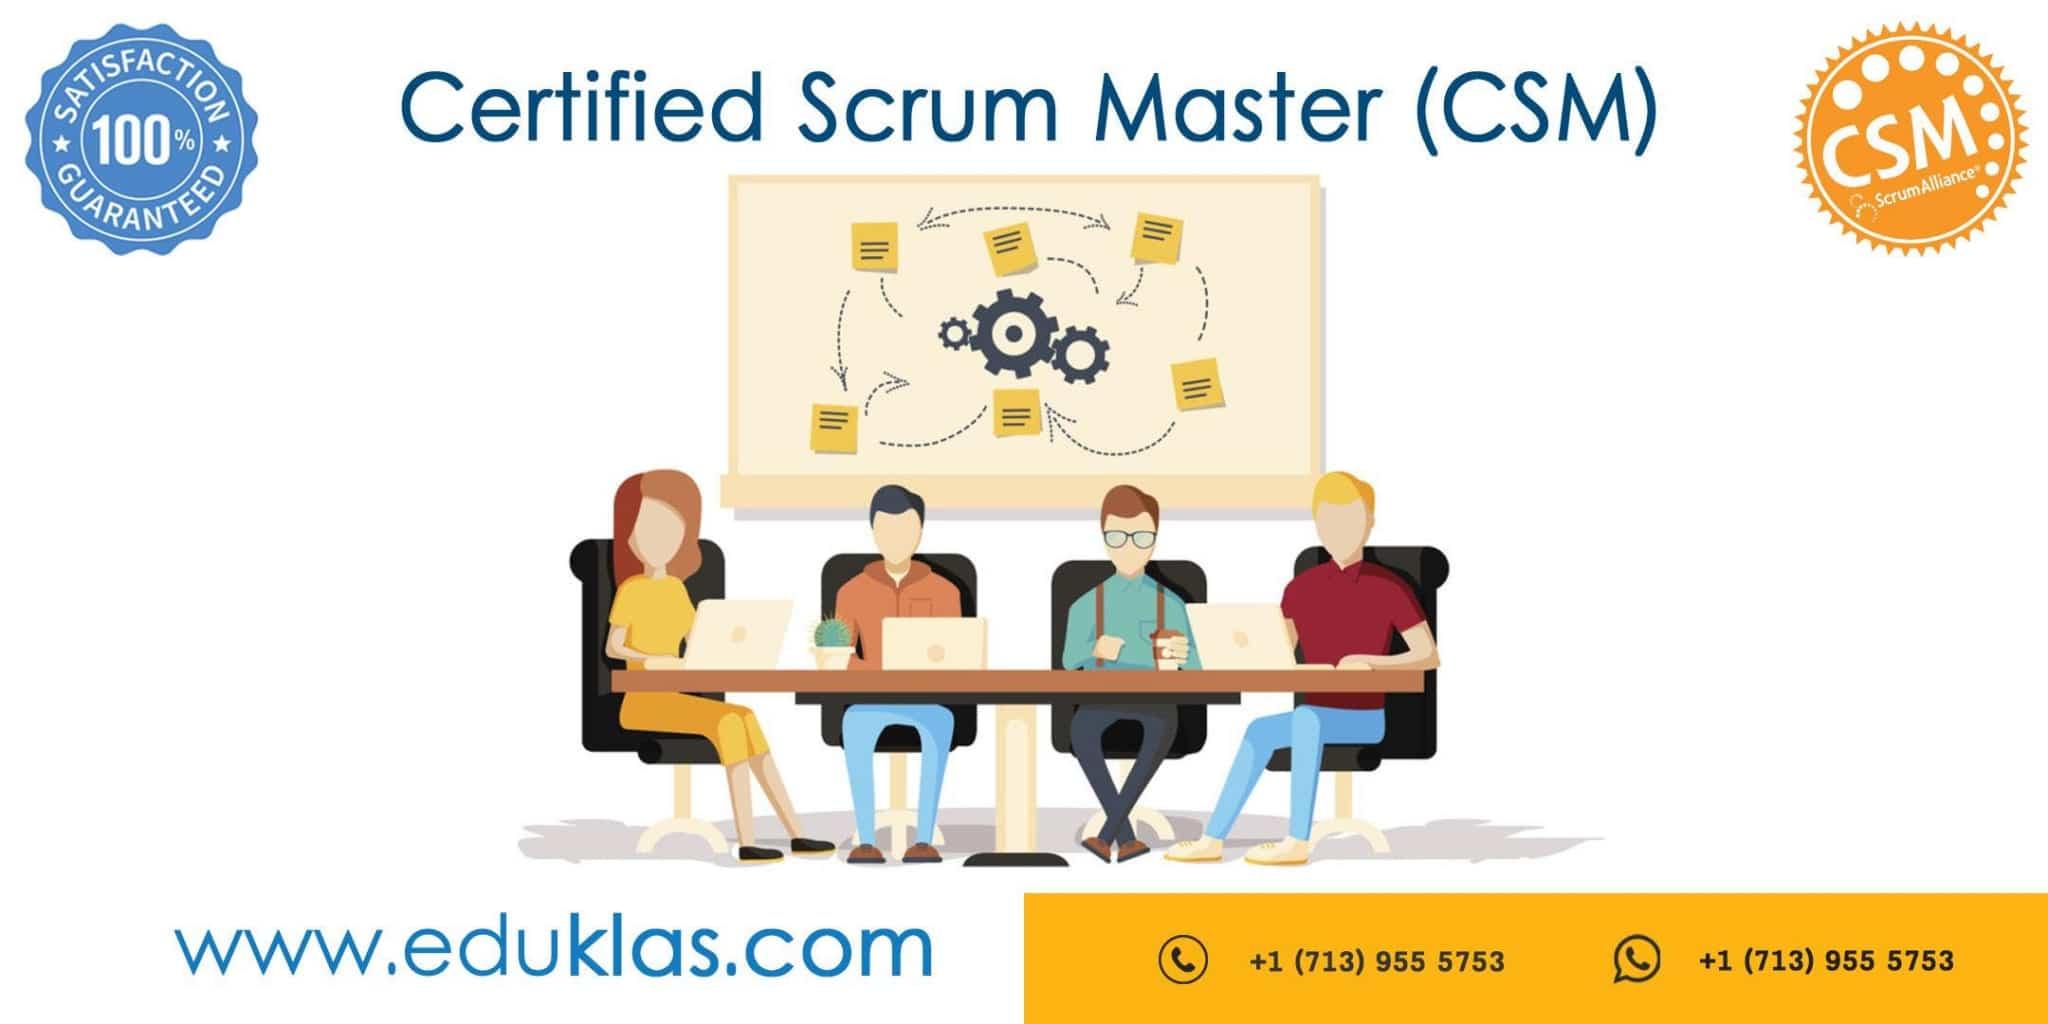 Agile Scrum Project Management Certification scrum master certification | csm training | csm